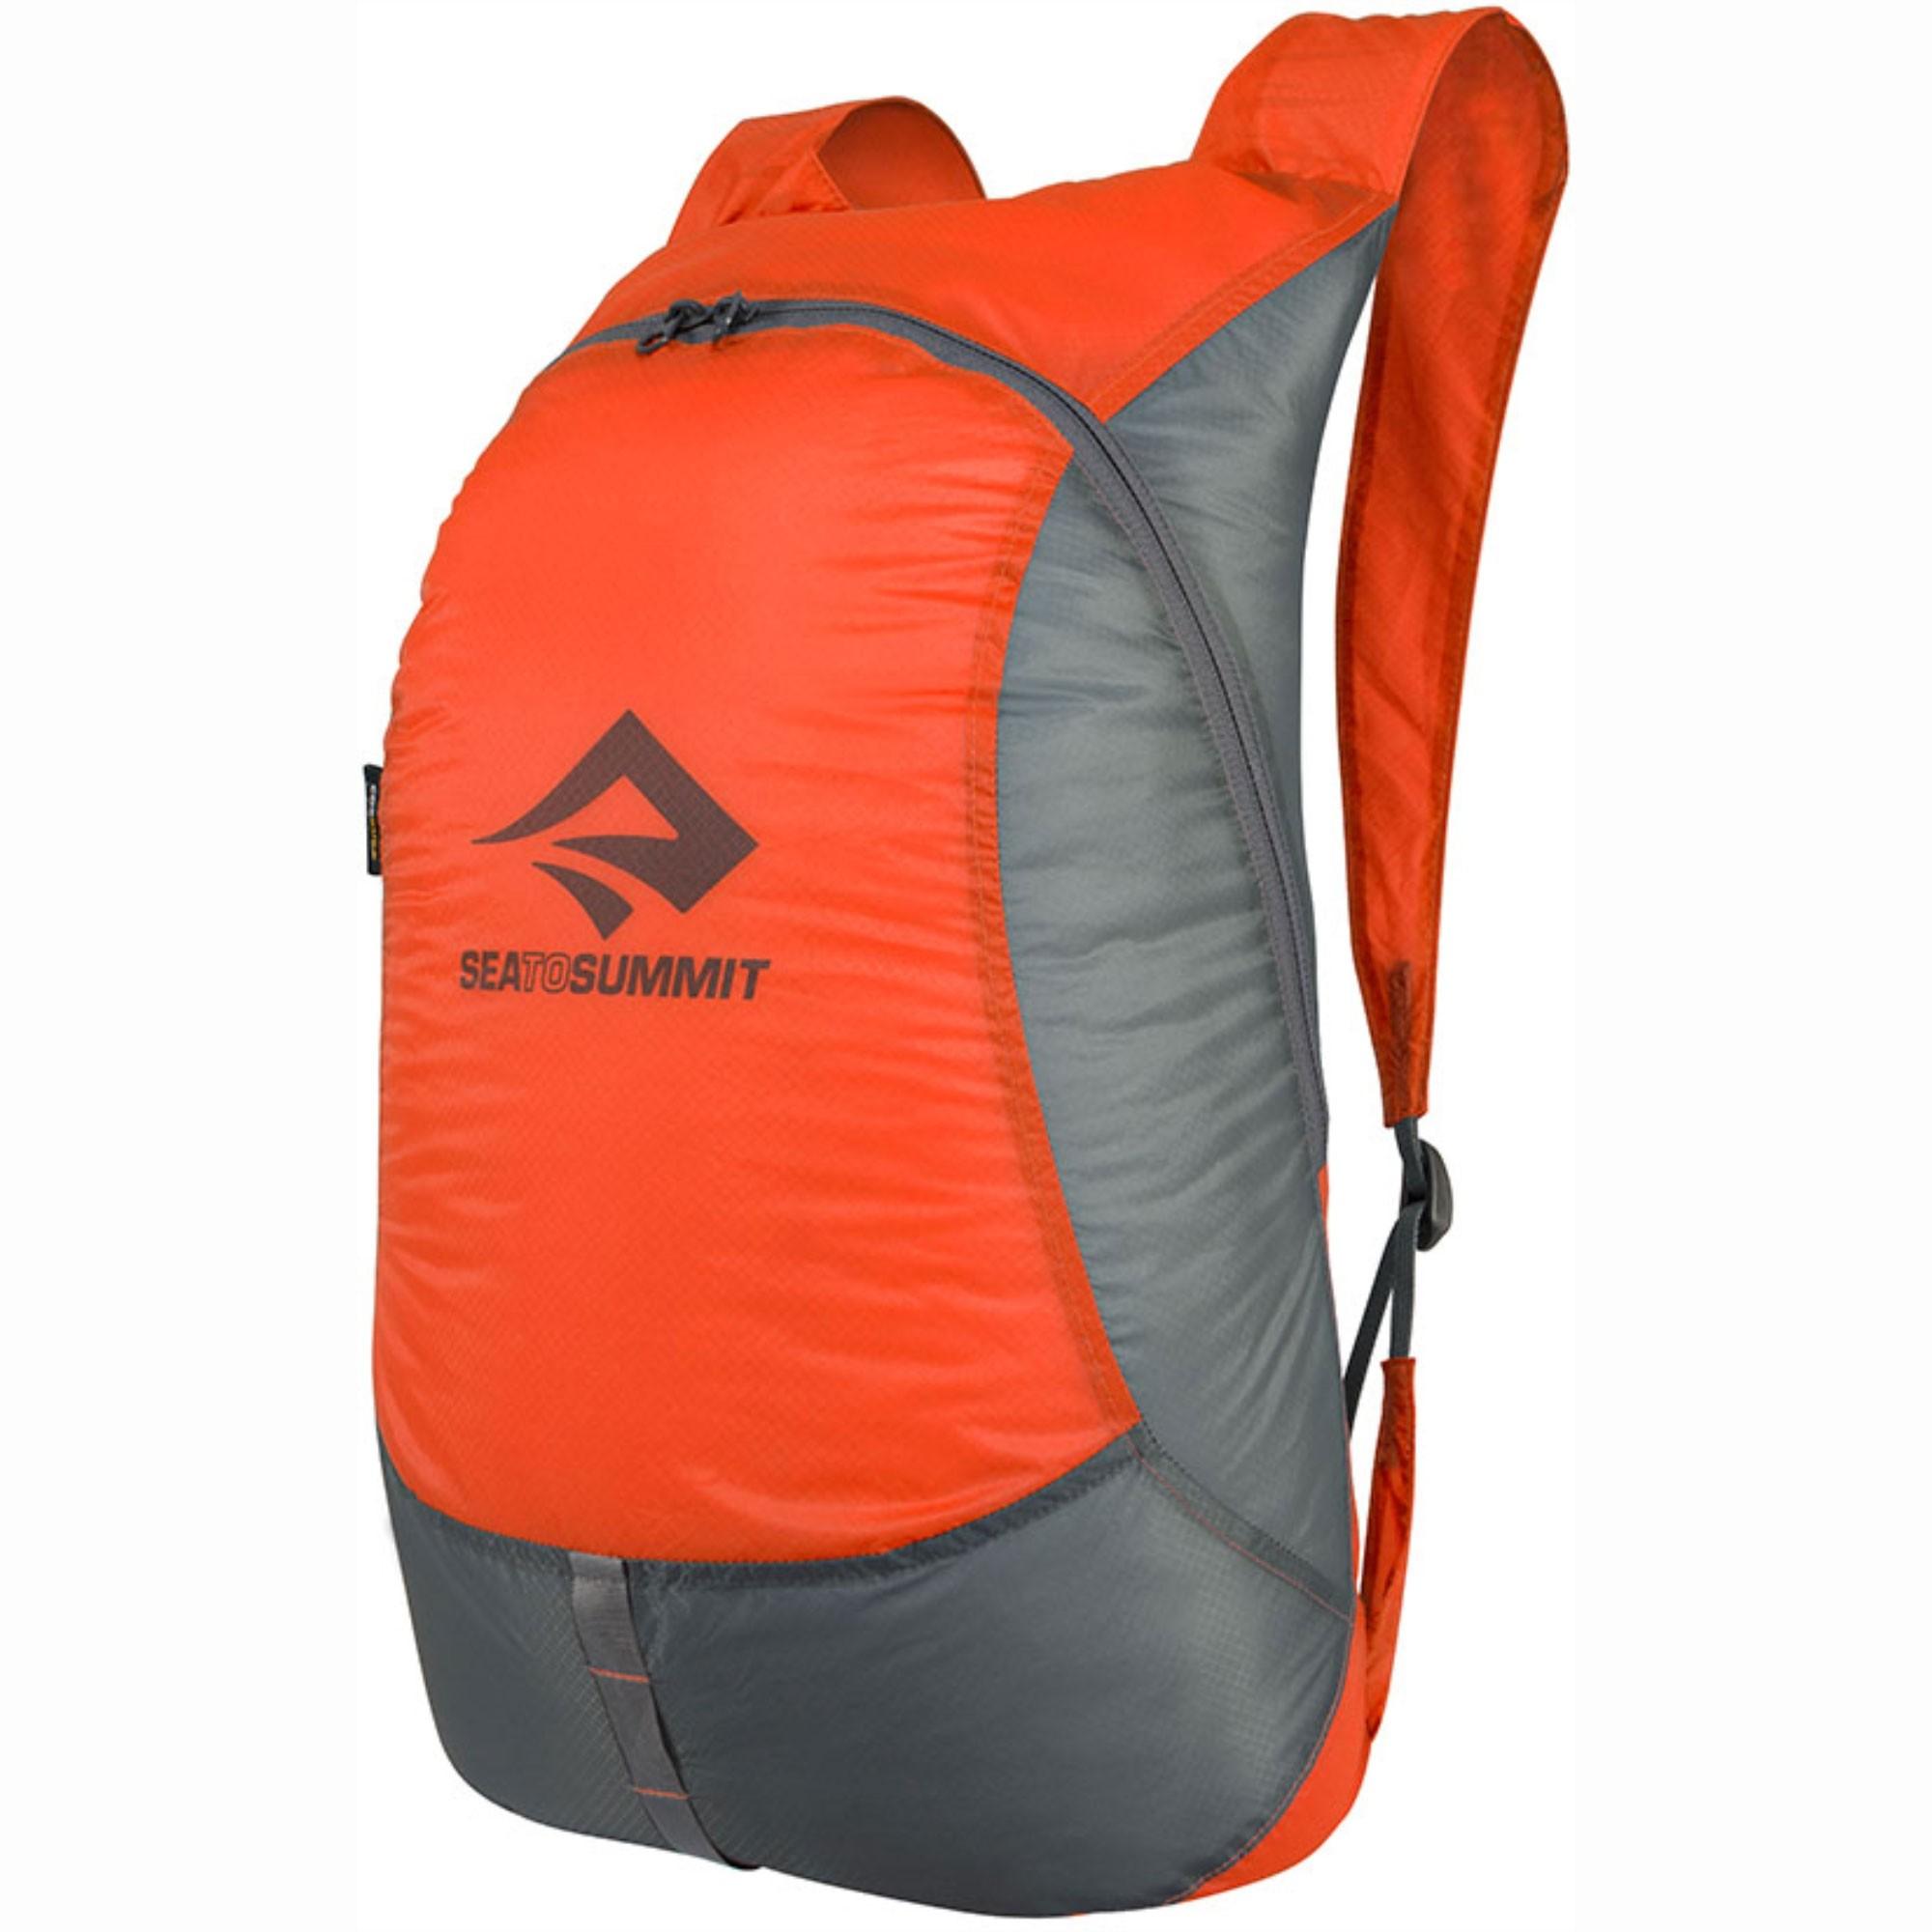 Sea to Summit Ultra-Sil Daypack - Orange